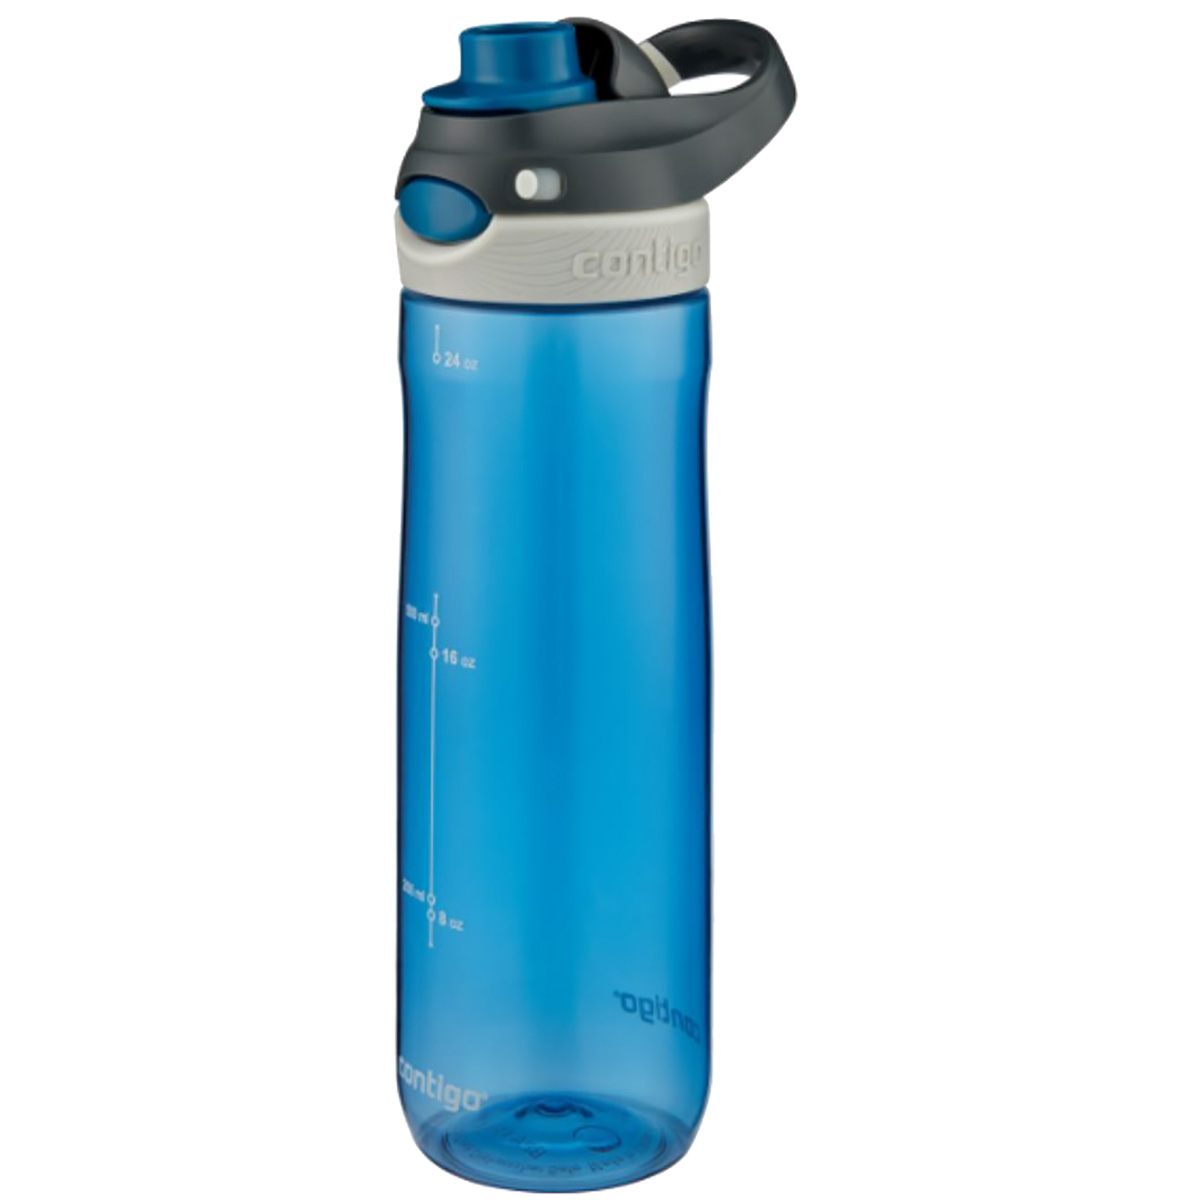 Contigo-24-oz-Chug-Autospout-Leak-Proof-Water-Bottle miniatuur 11